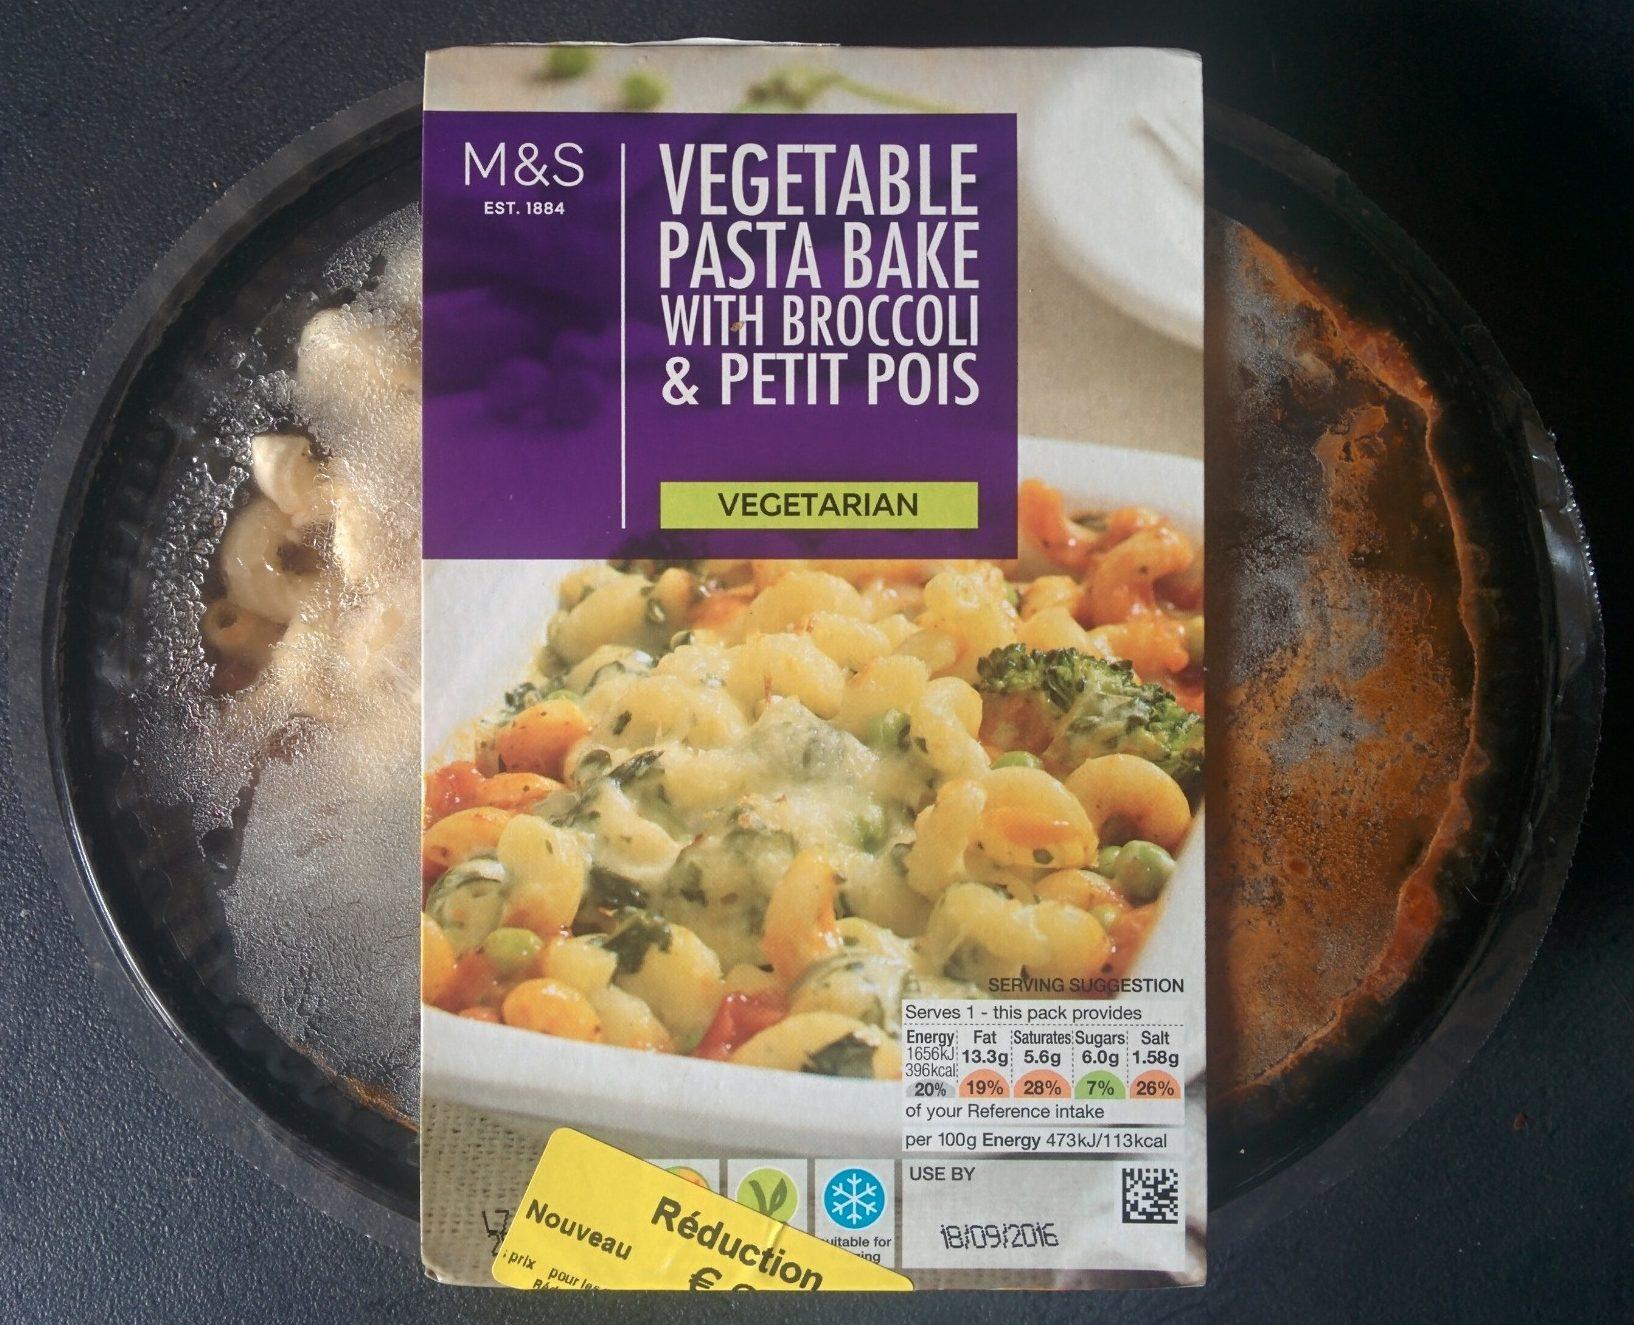 Vegetable Pasta Bake with Broccoli & Petit Pois - Produit - fr